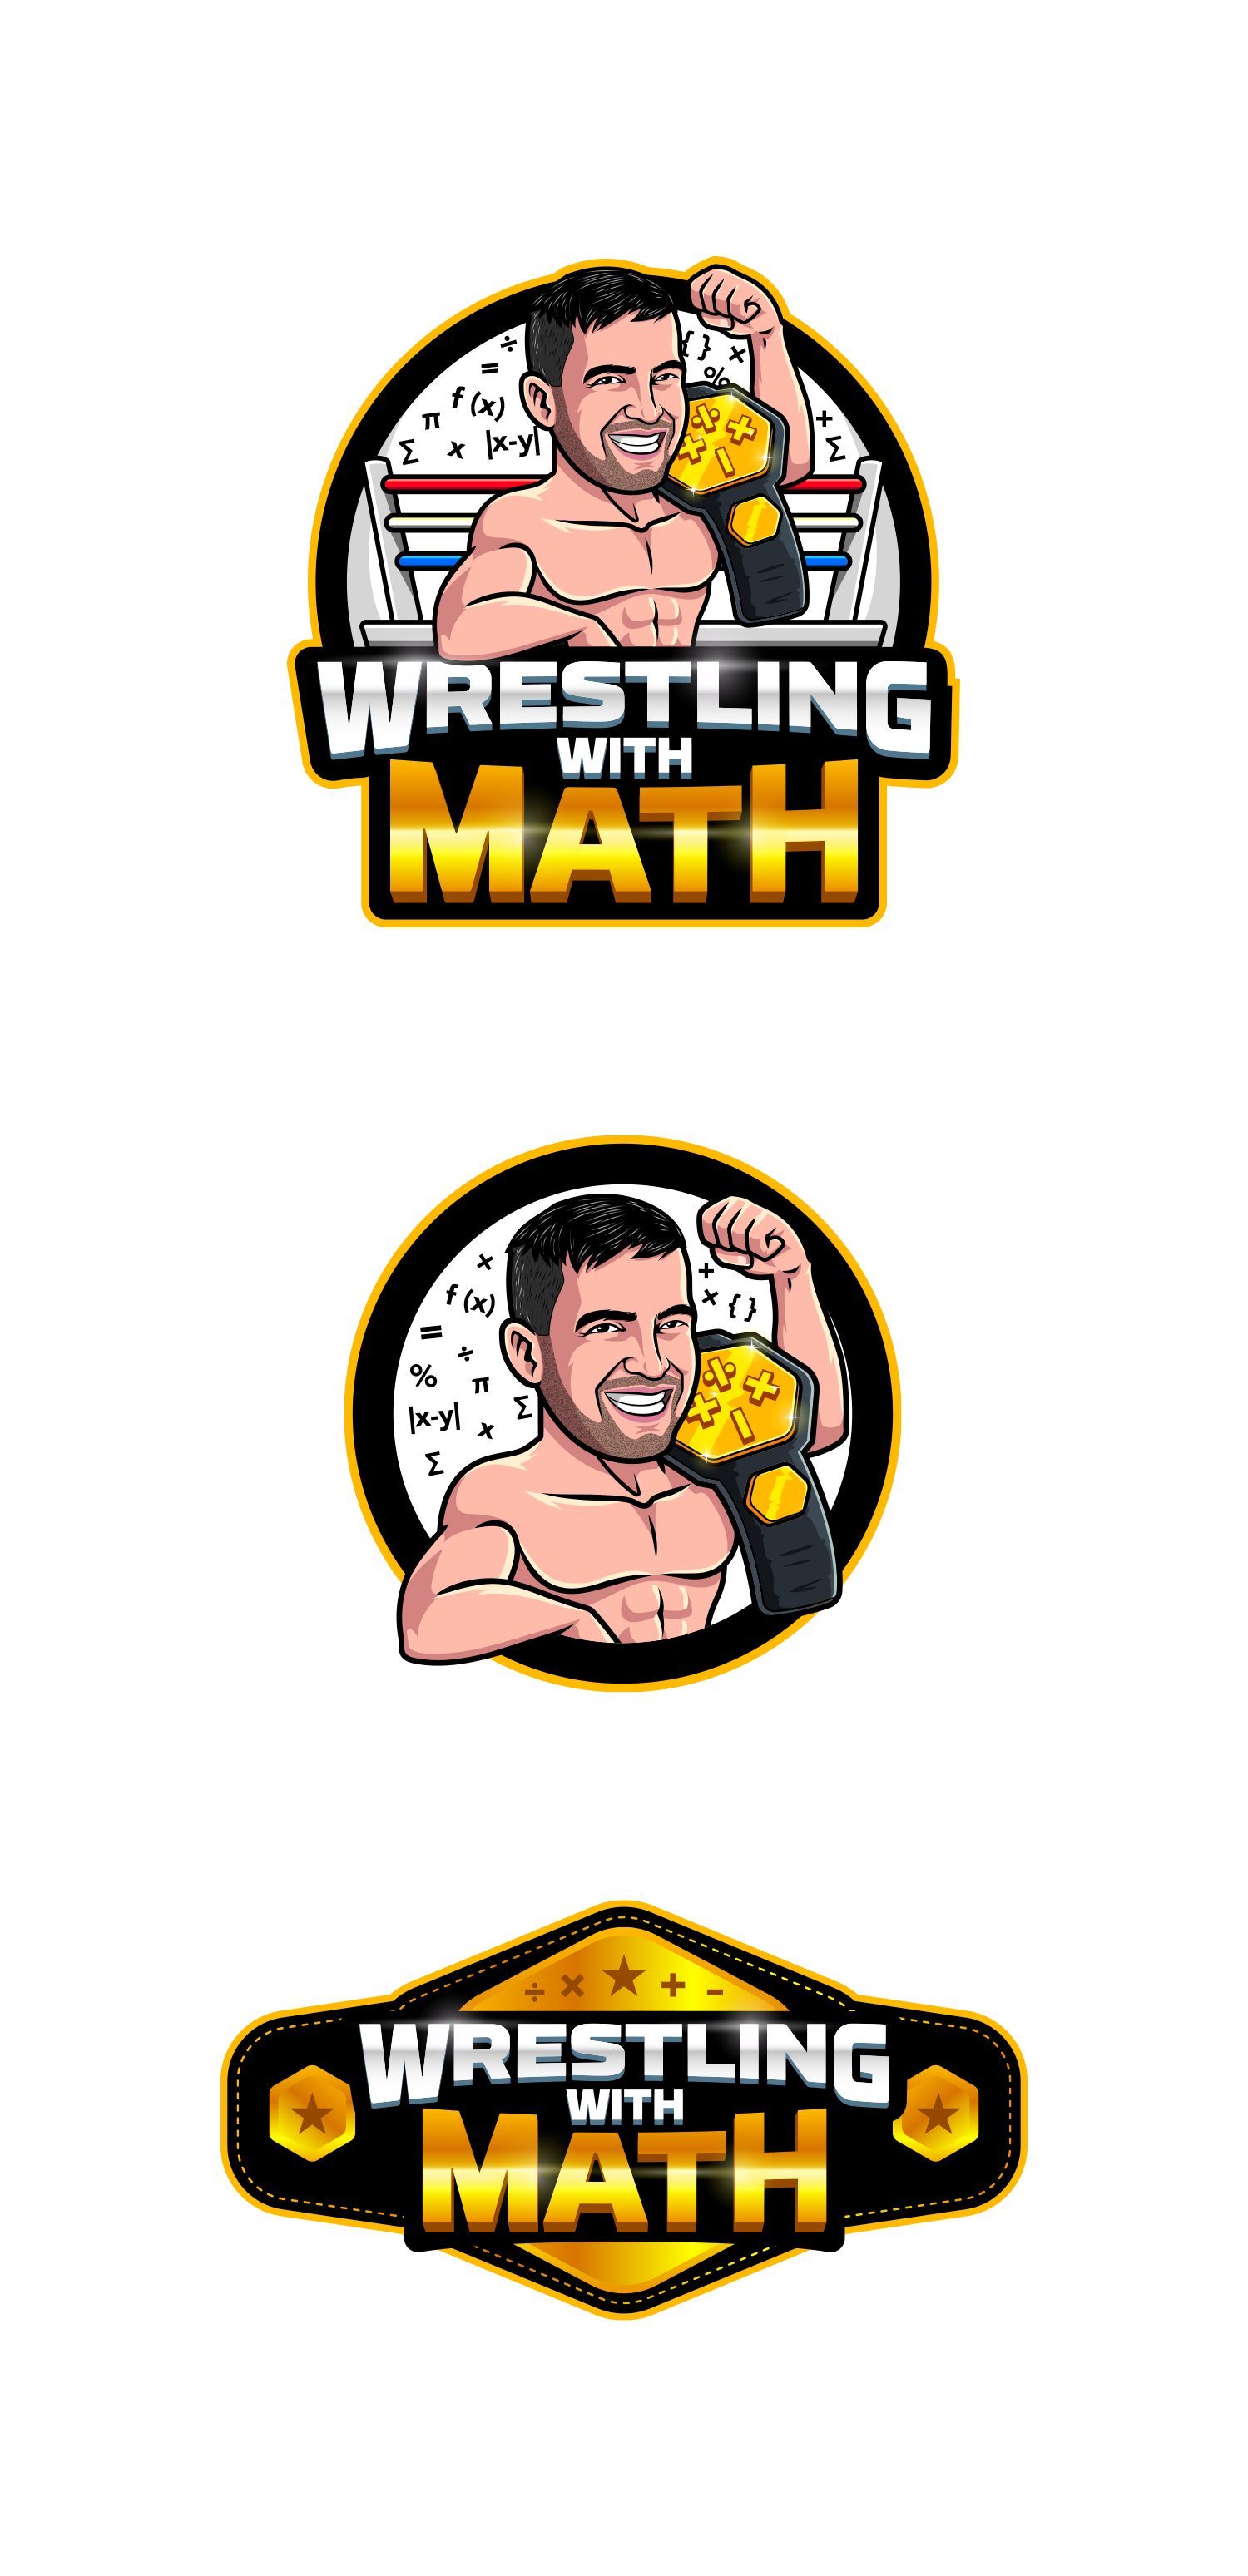 Wrestling with math logo